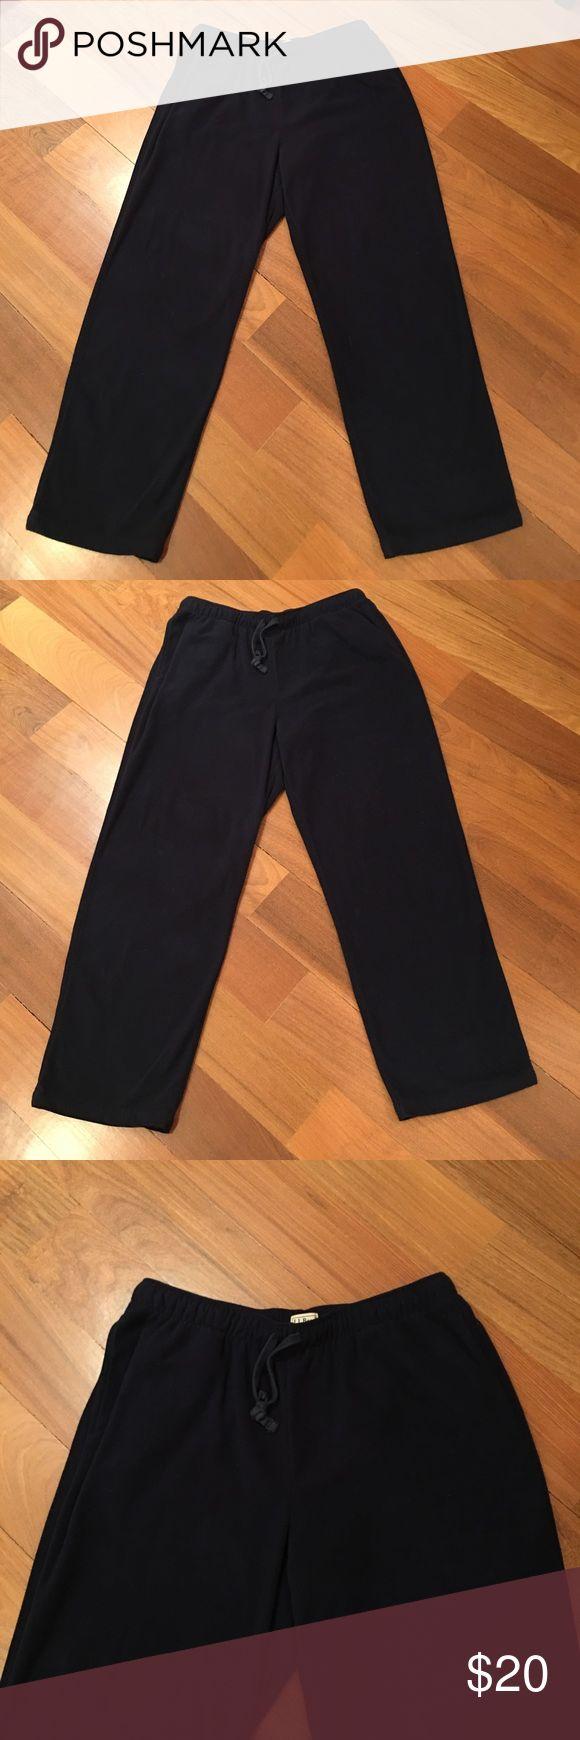 Men's L.L. Bean Fleece Pants Size large tall. Black comfortable fleece pants. Has pockets L.L. Bean Pants Sweatpants & Joggers